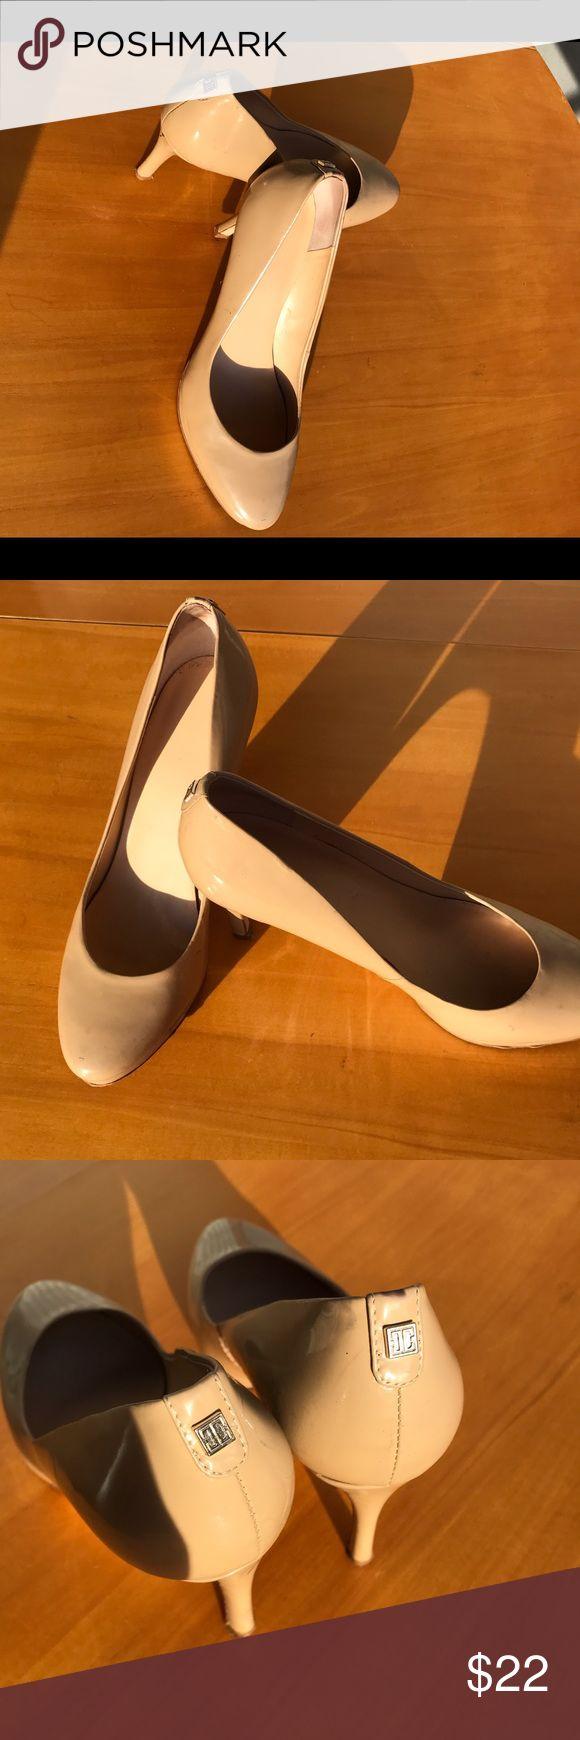 Ivanka Trump🚩FINAL SALE!!! ••• Nude 👠 As seen in pictures Ivanka Trump Shoes Heels